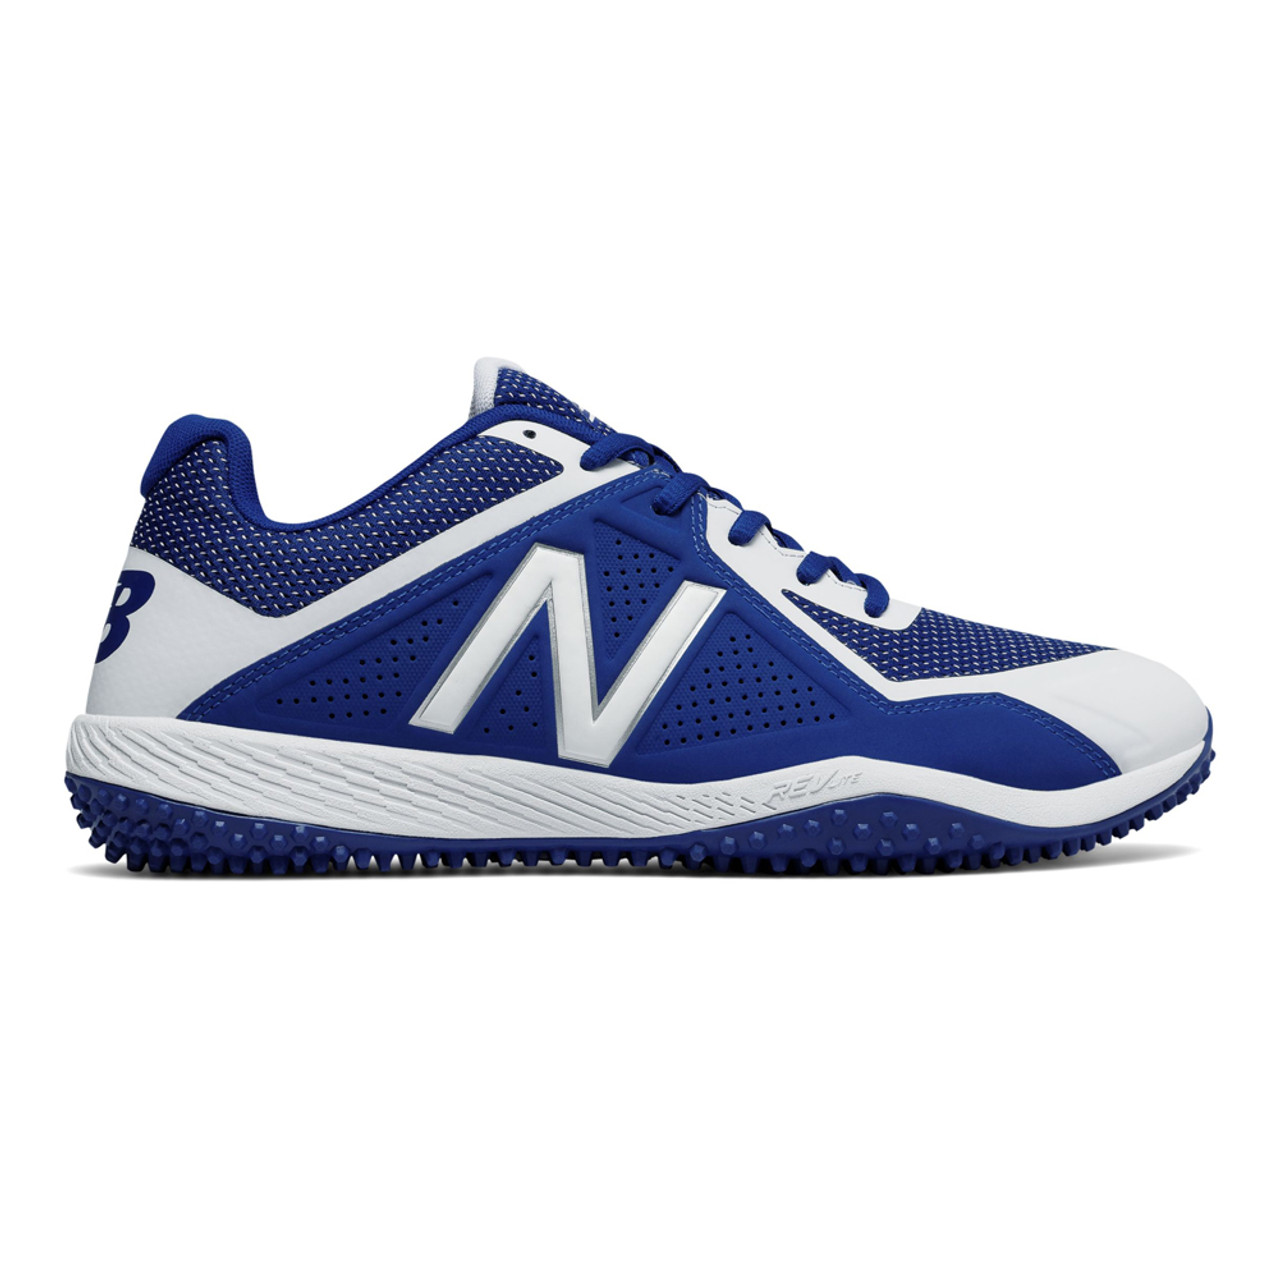 2c4d63fc66922 New Balance Men's T4040TB4 Baseball Turf Shoes Royal Blue/White - Shop now  @ Shoolu